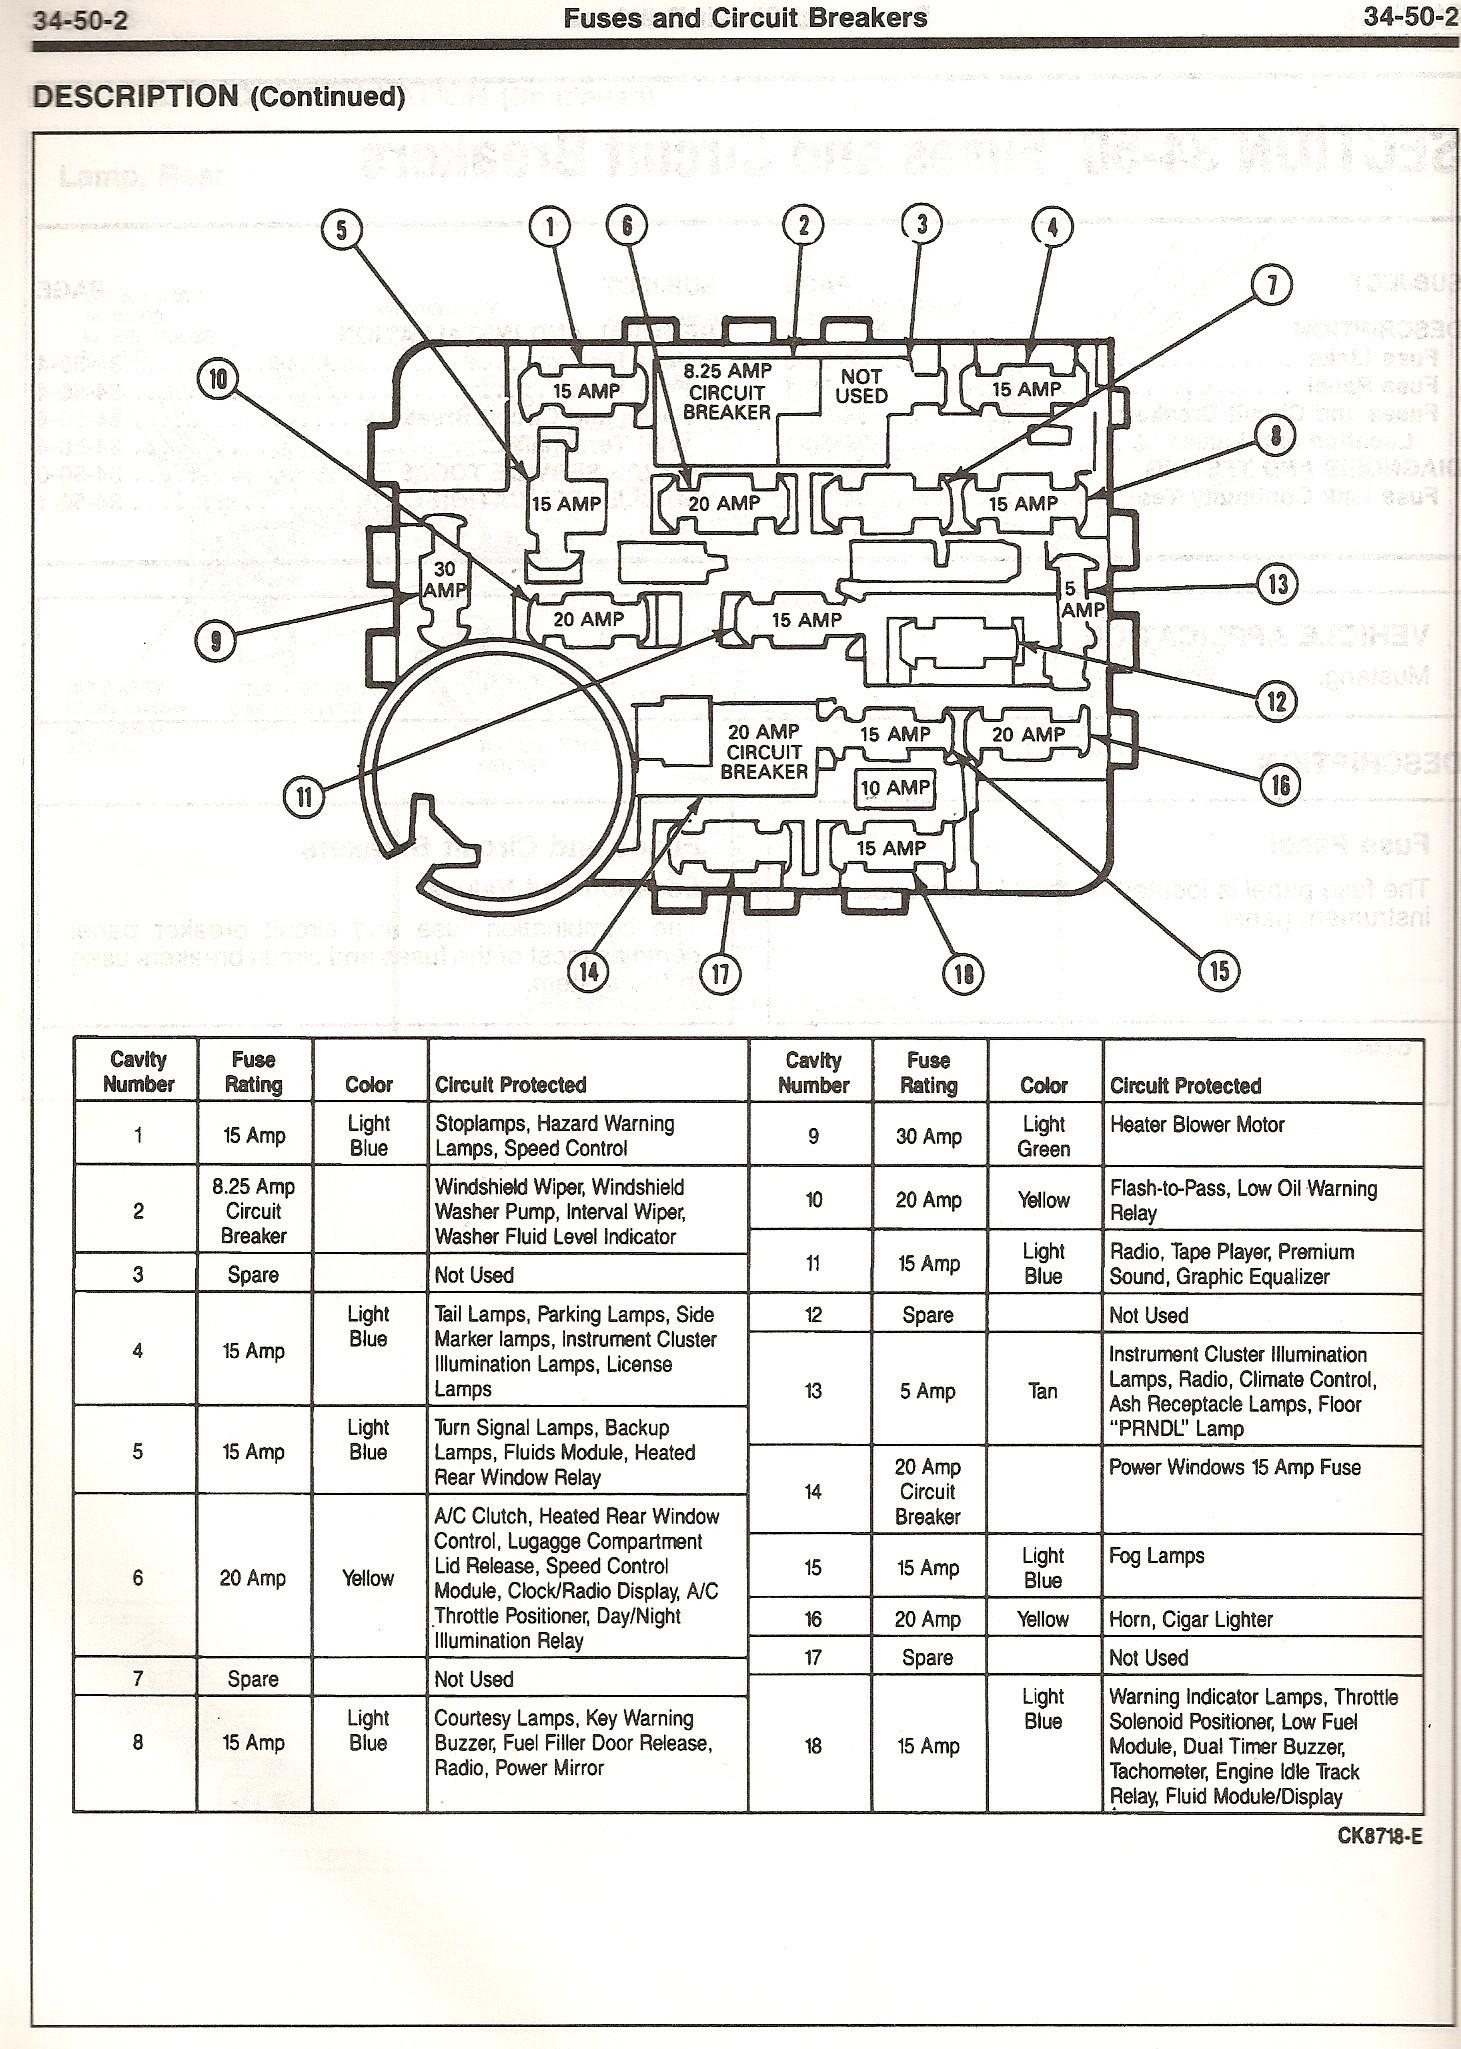 96 Mustang Engine Diagram 1996 Mustang Fuse Panel Diagram Wiring Diagram Used Of 96 Mustang Engine Diagram